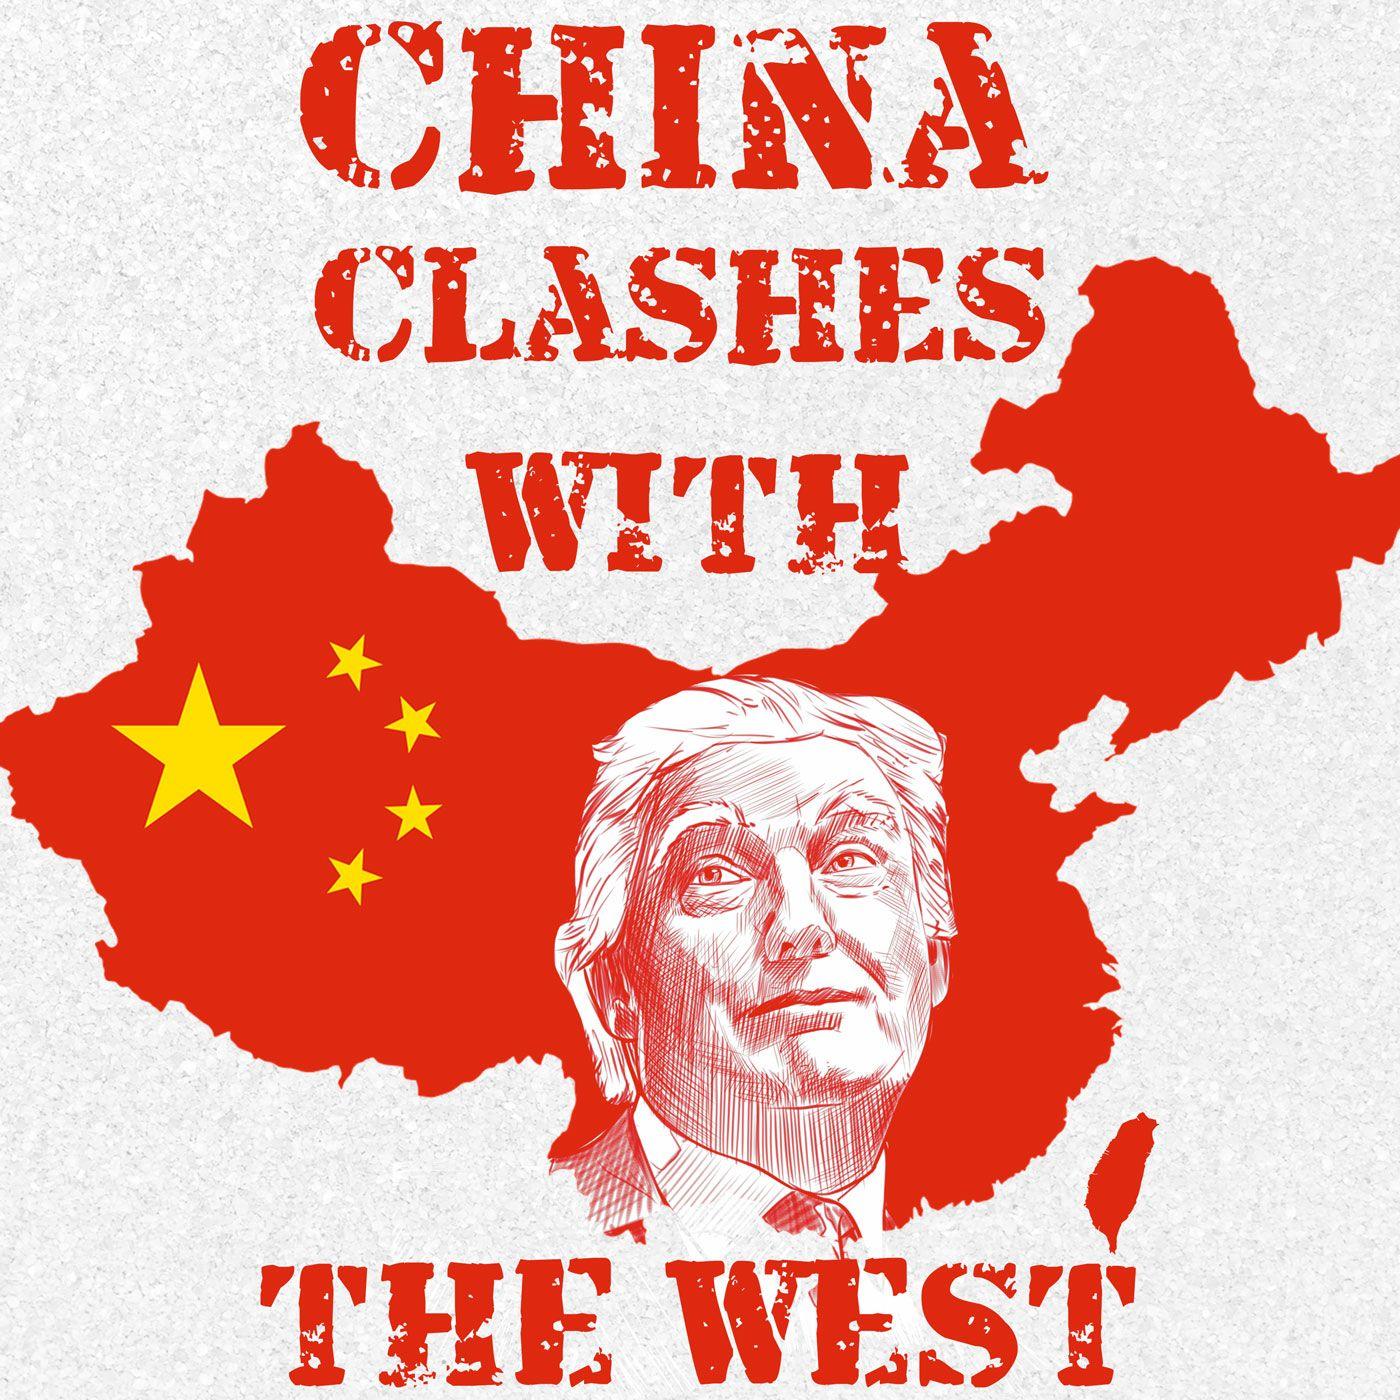 Episode 3: West Media Coverage of China